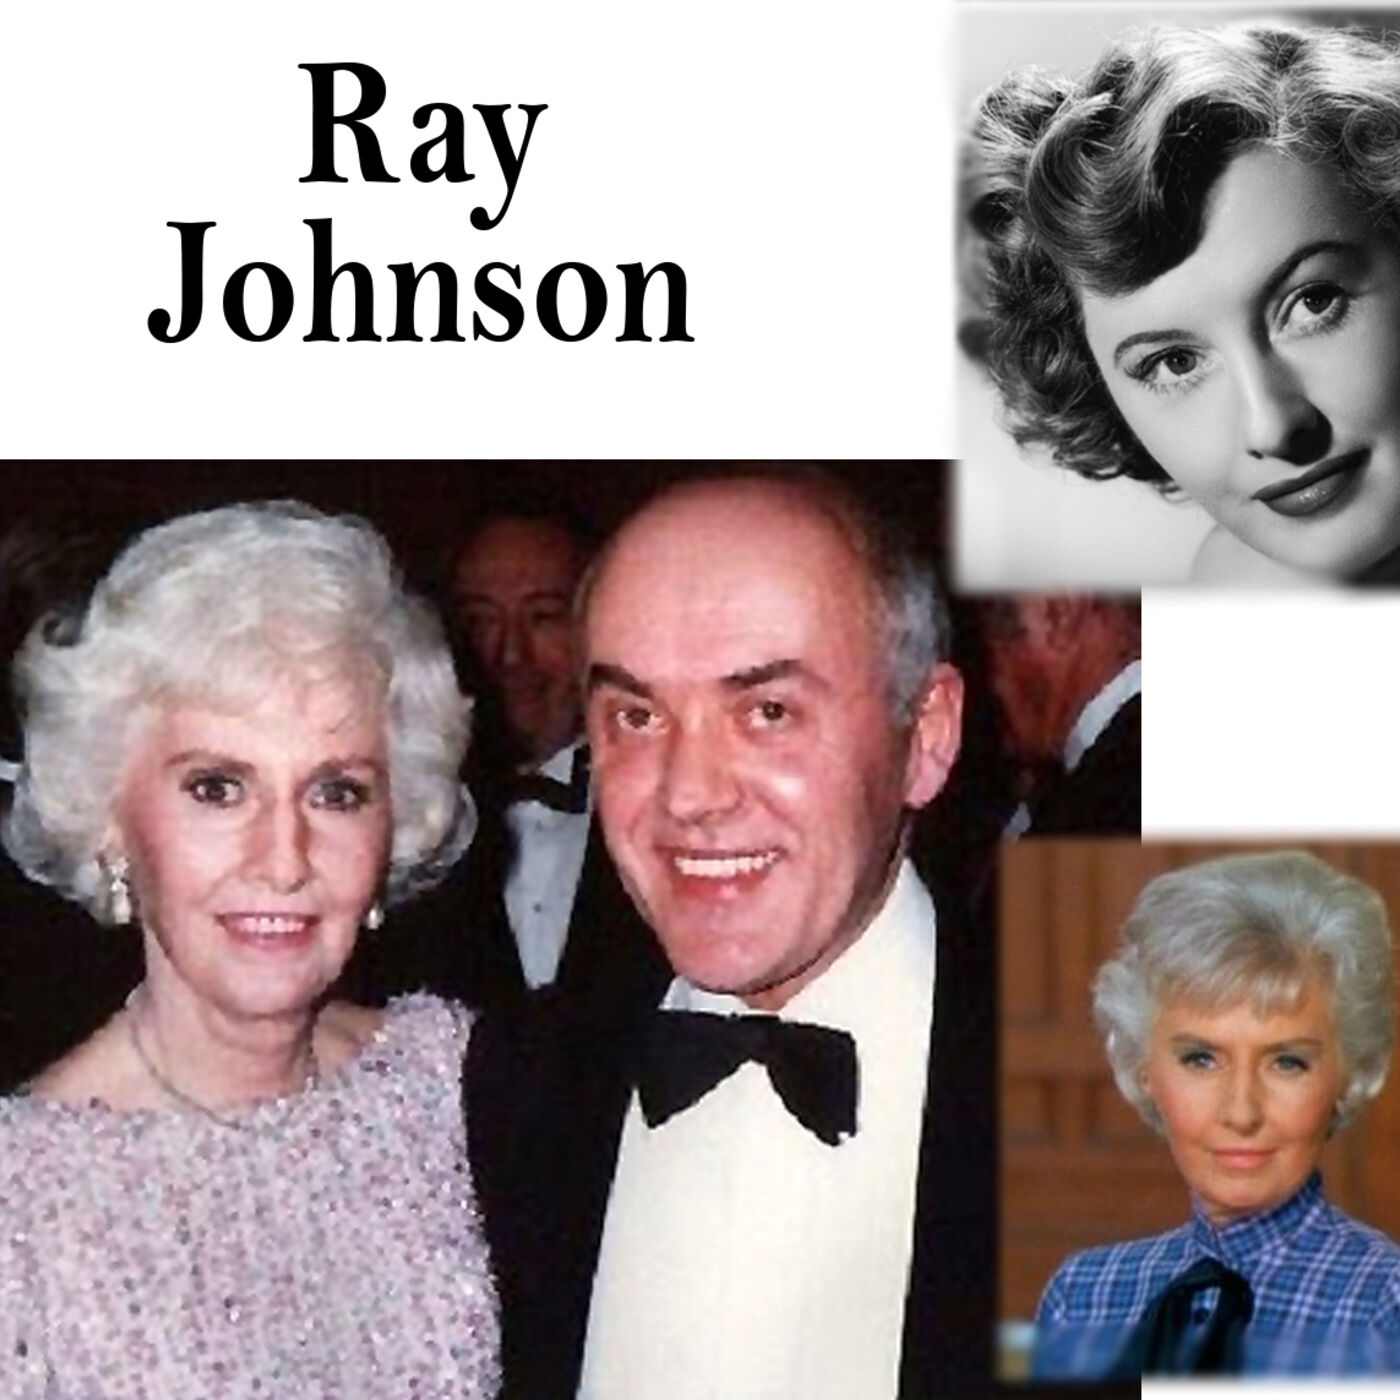 Harvey Brownstone Interviews Ray Johnson, Barbara Stanwyck Superfan